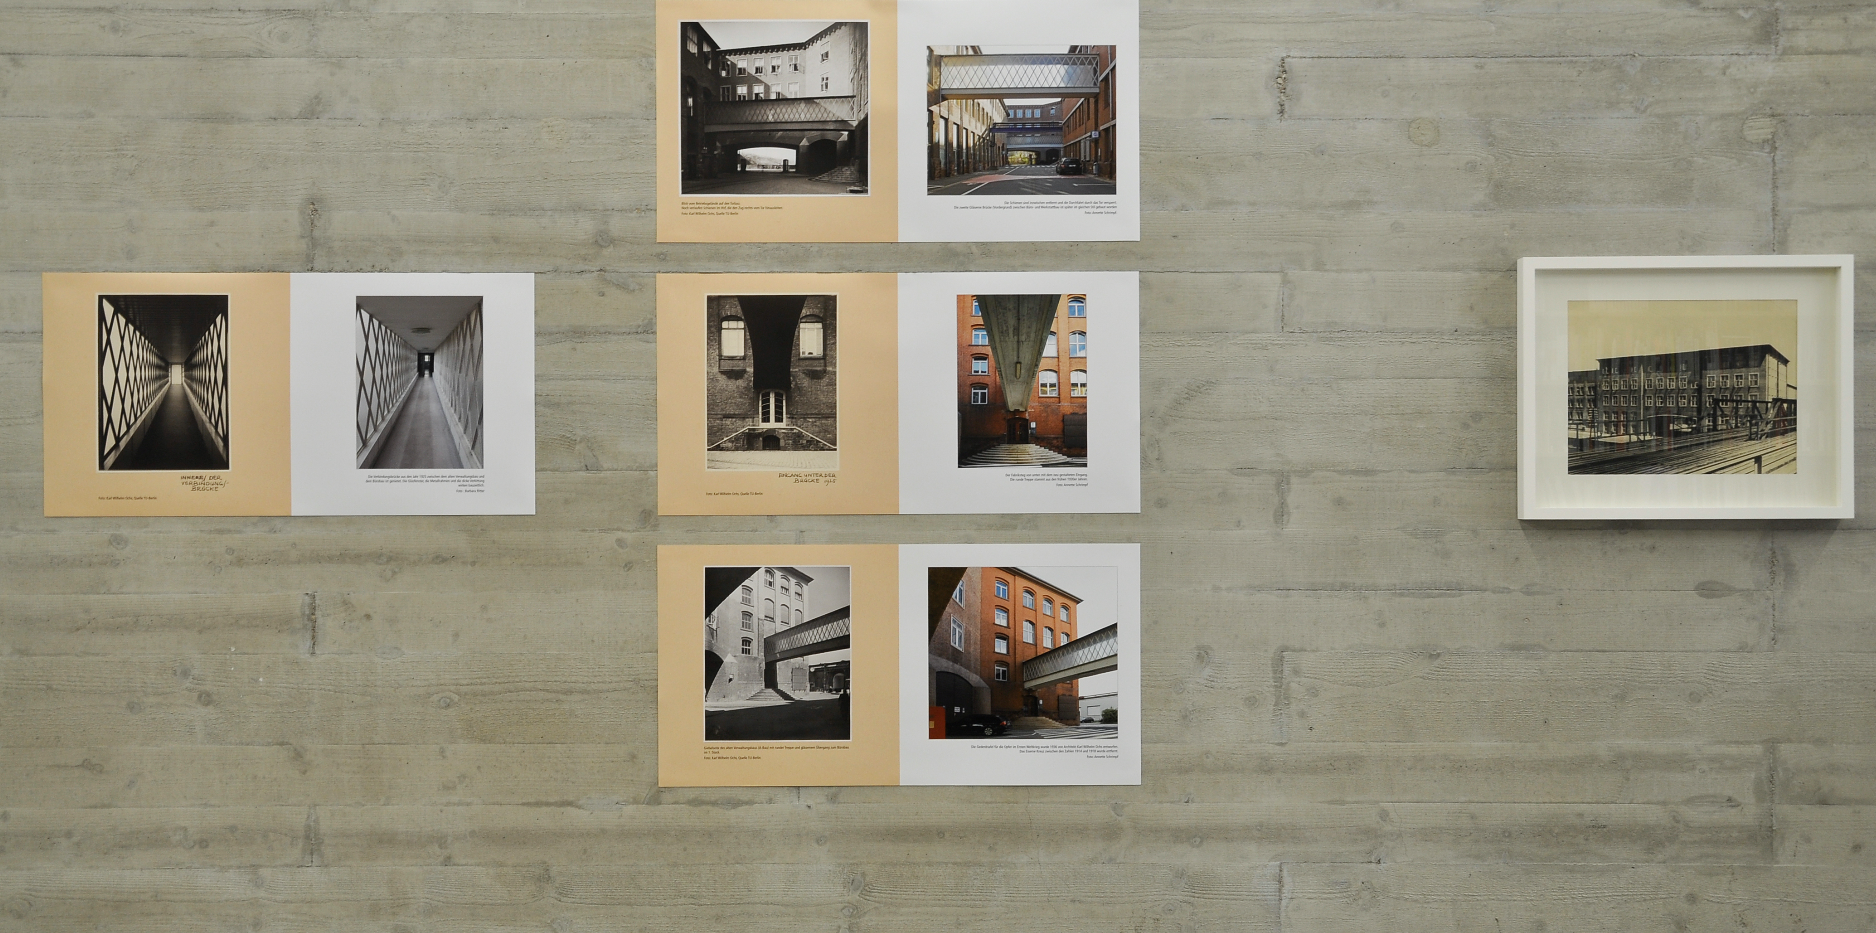 K. W. Ochs — Architekturfotografie